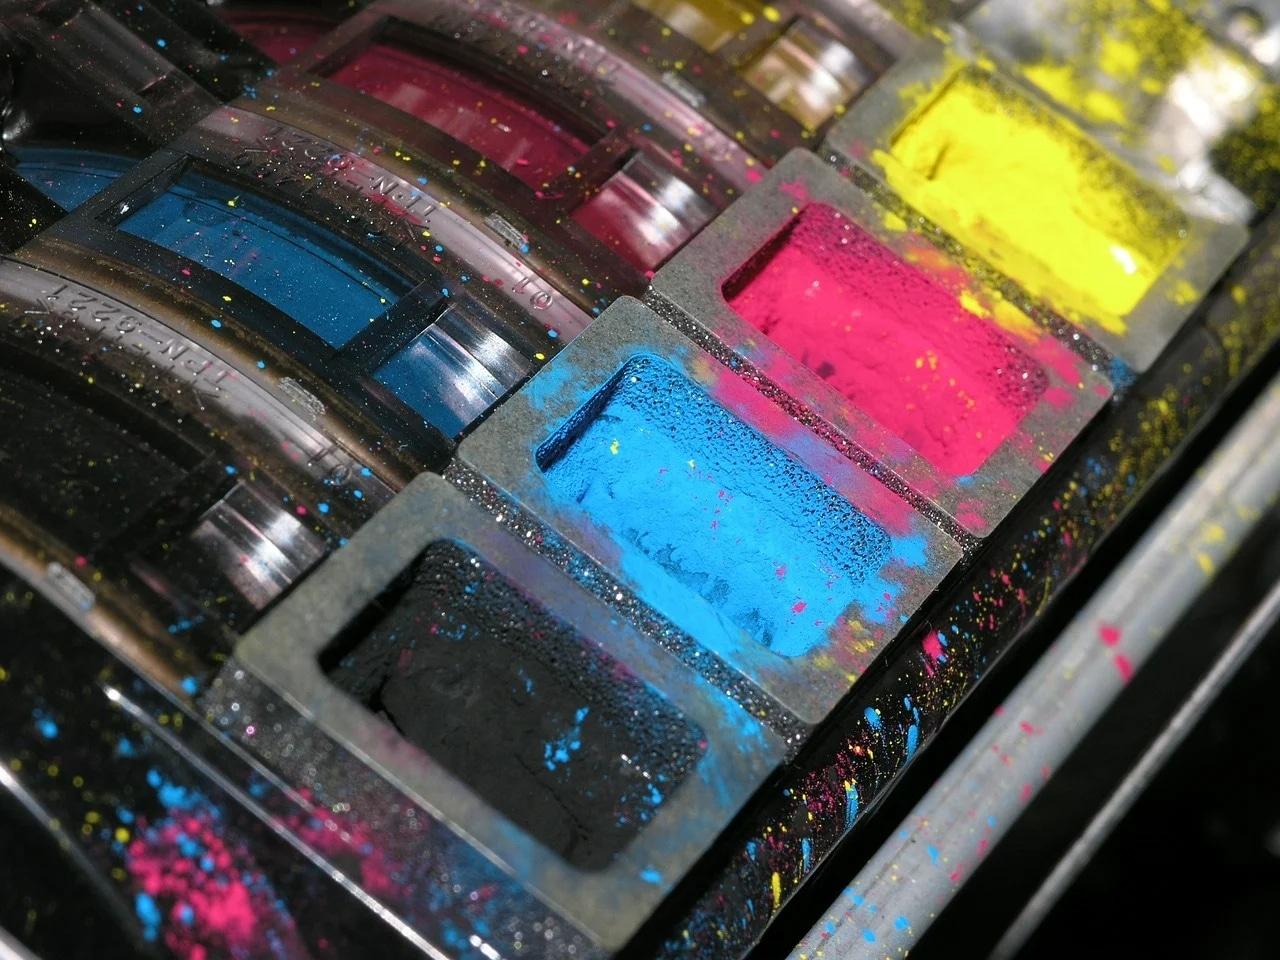 consumo de tinta en imrpesoras láser